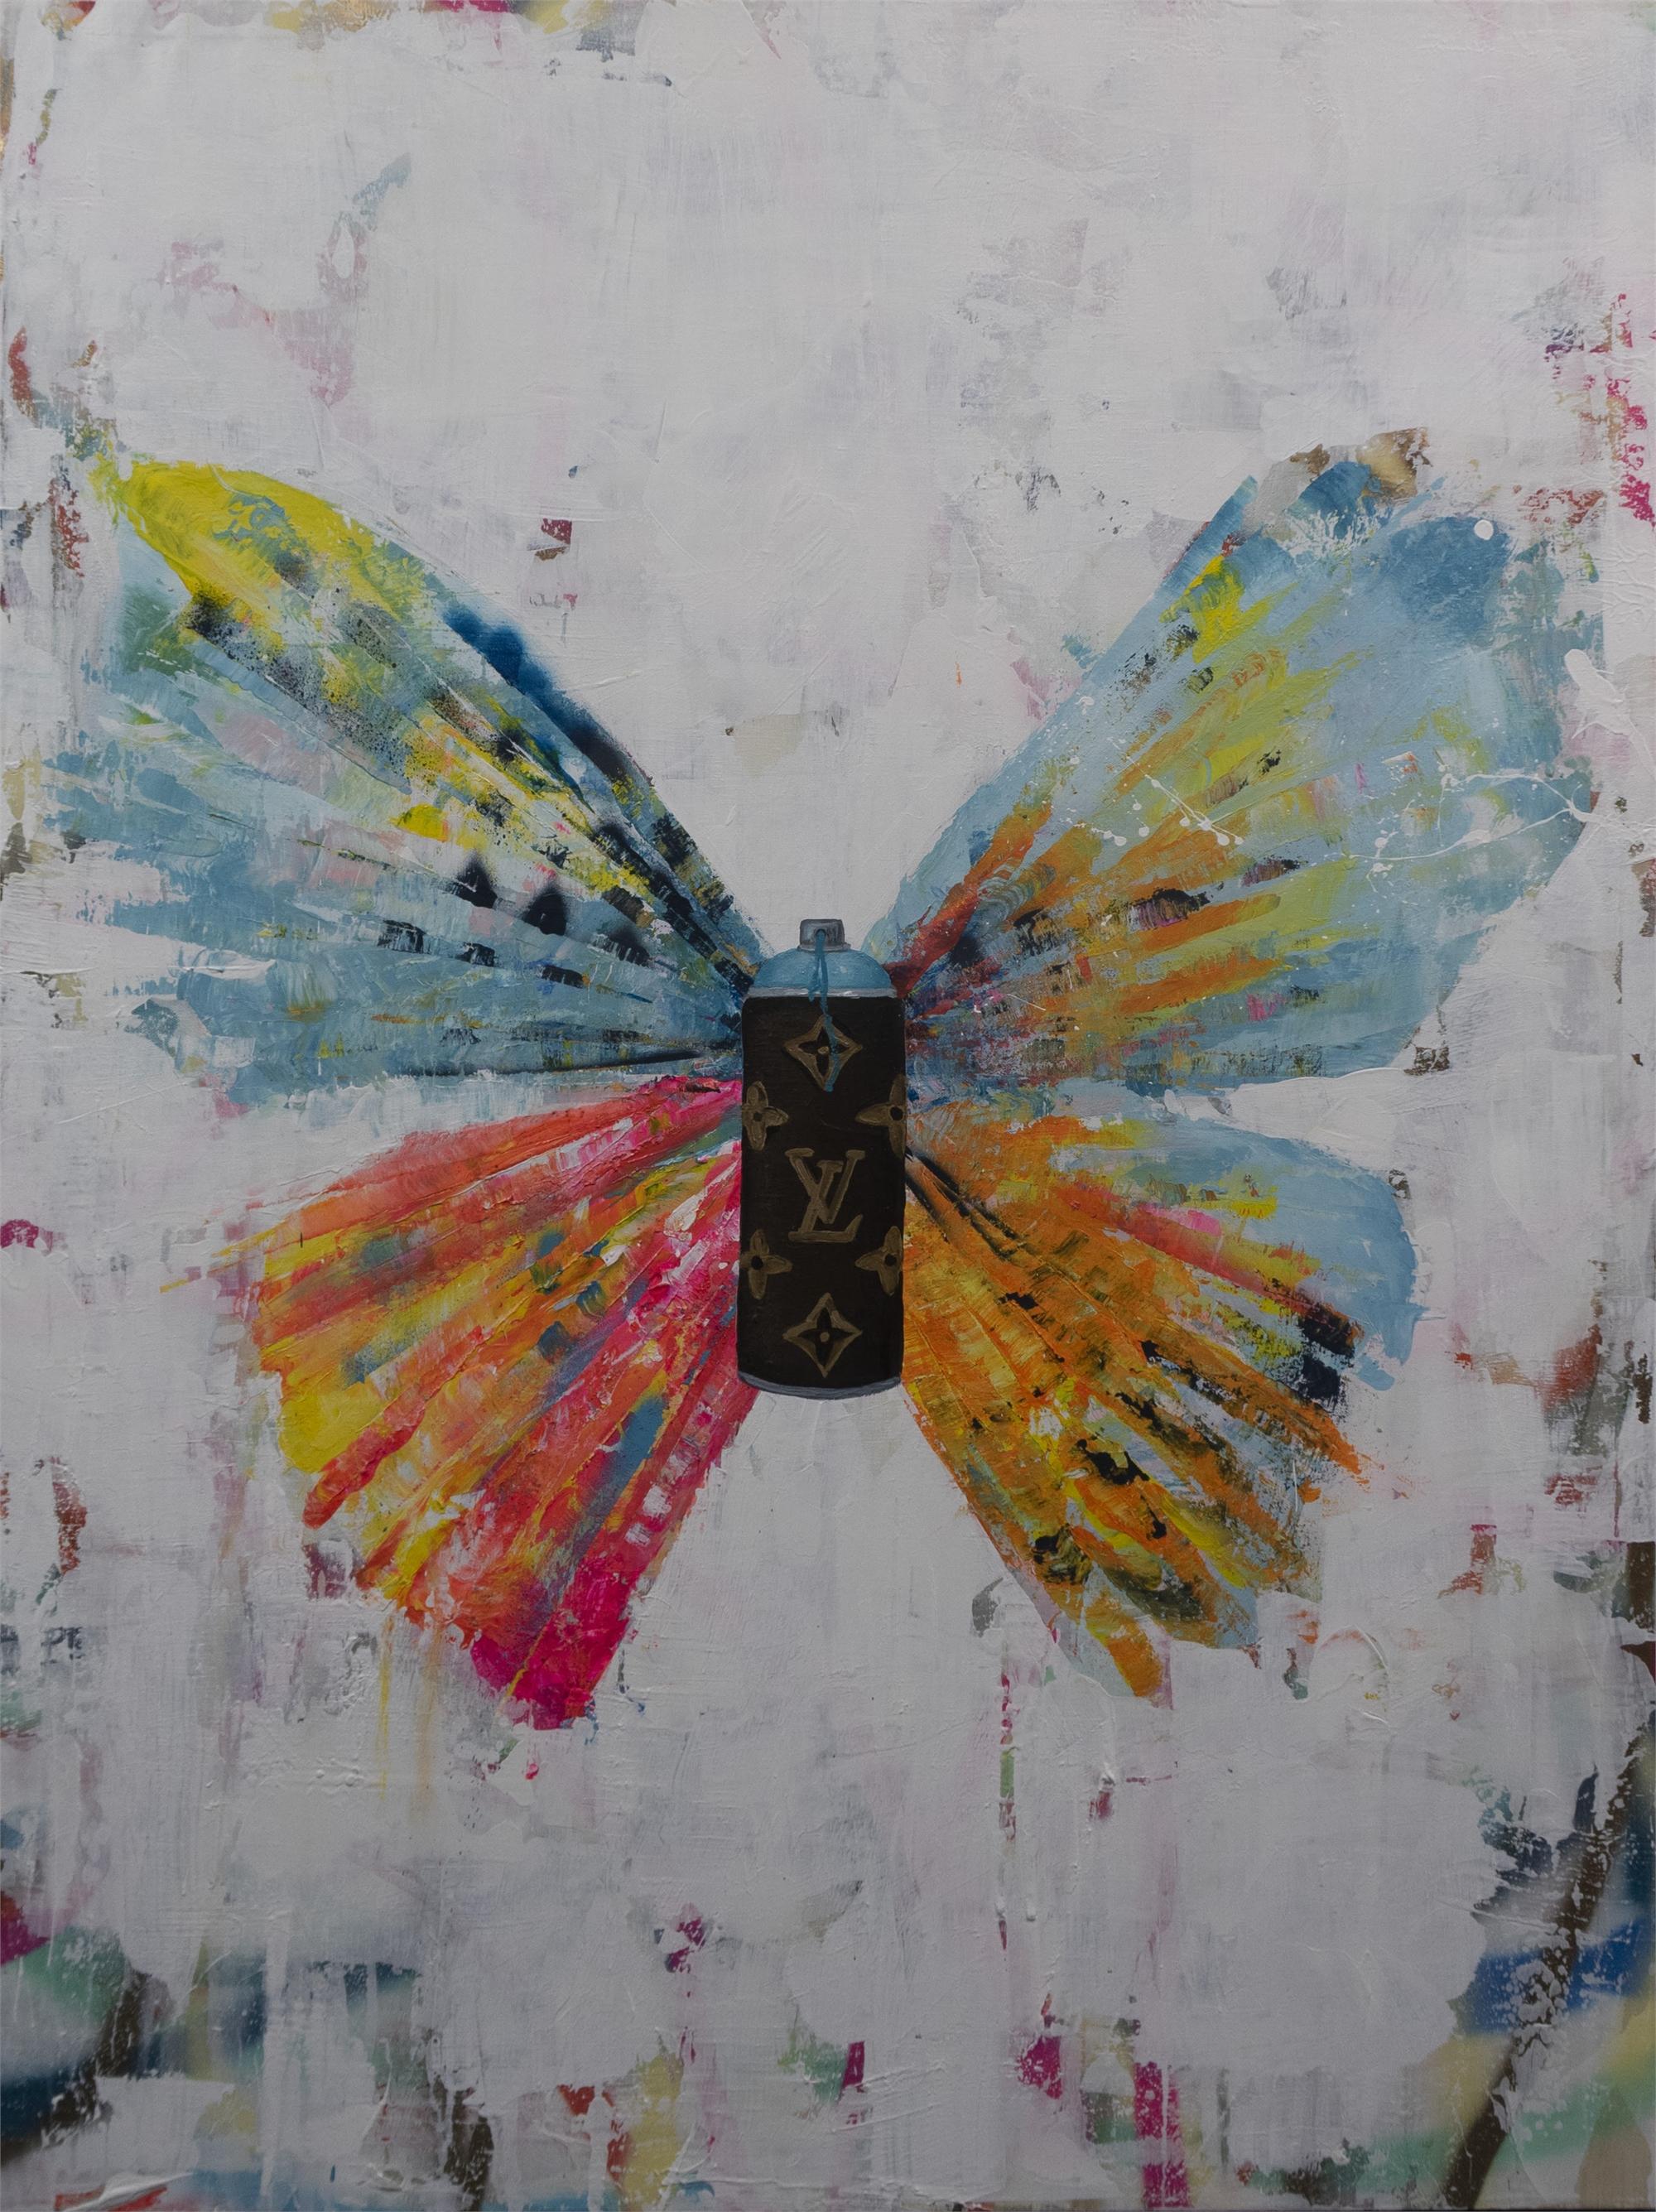 Butterfly With Spraycan by Daniel Maltzman